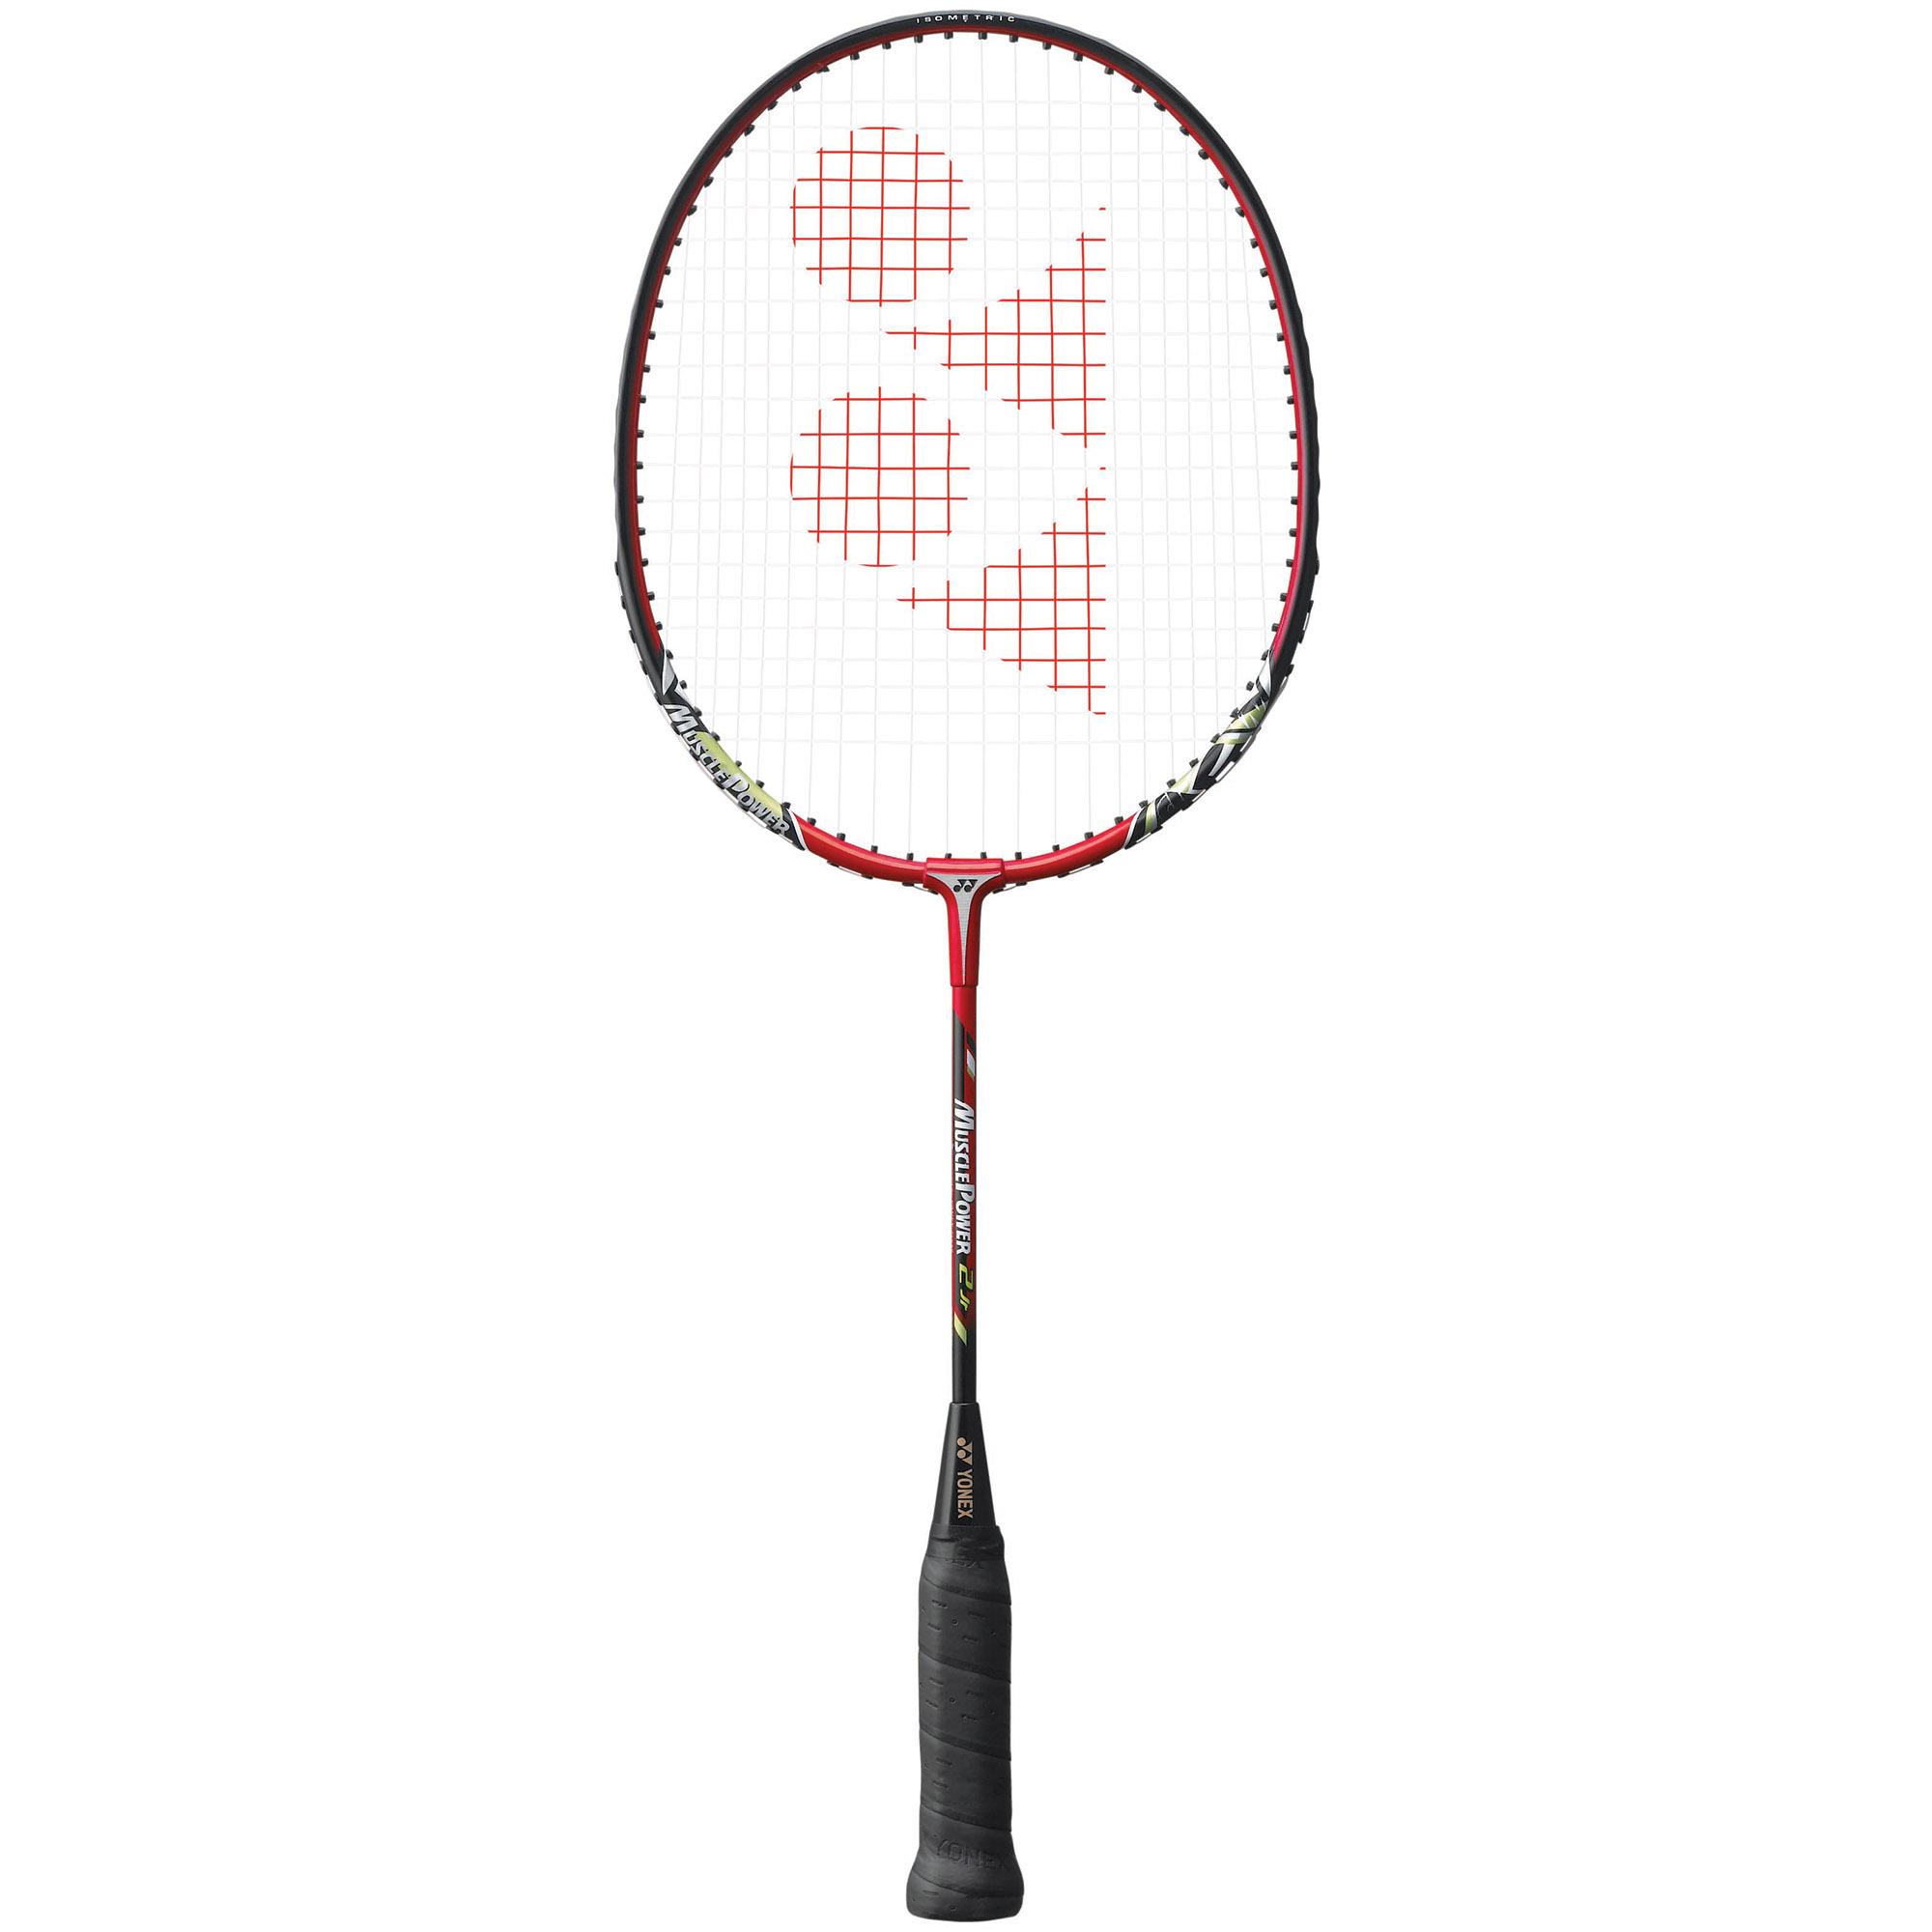 Yonex Badminton Price Comparison Results